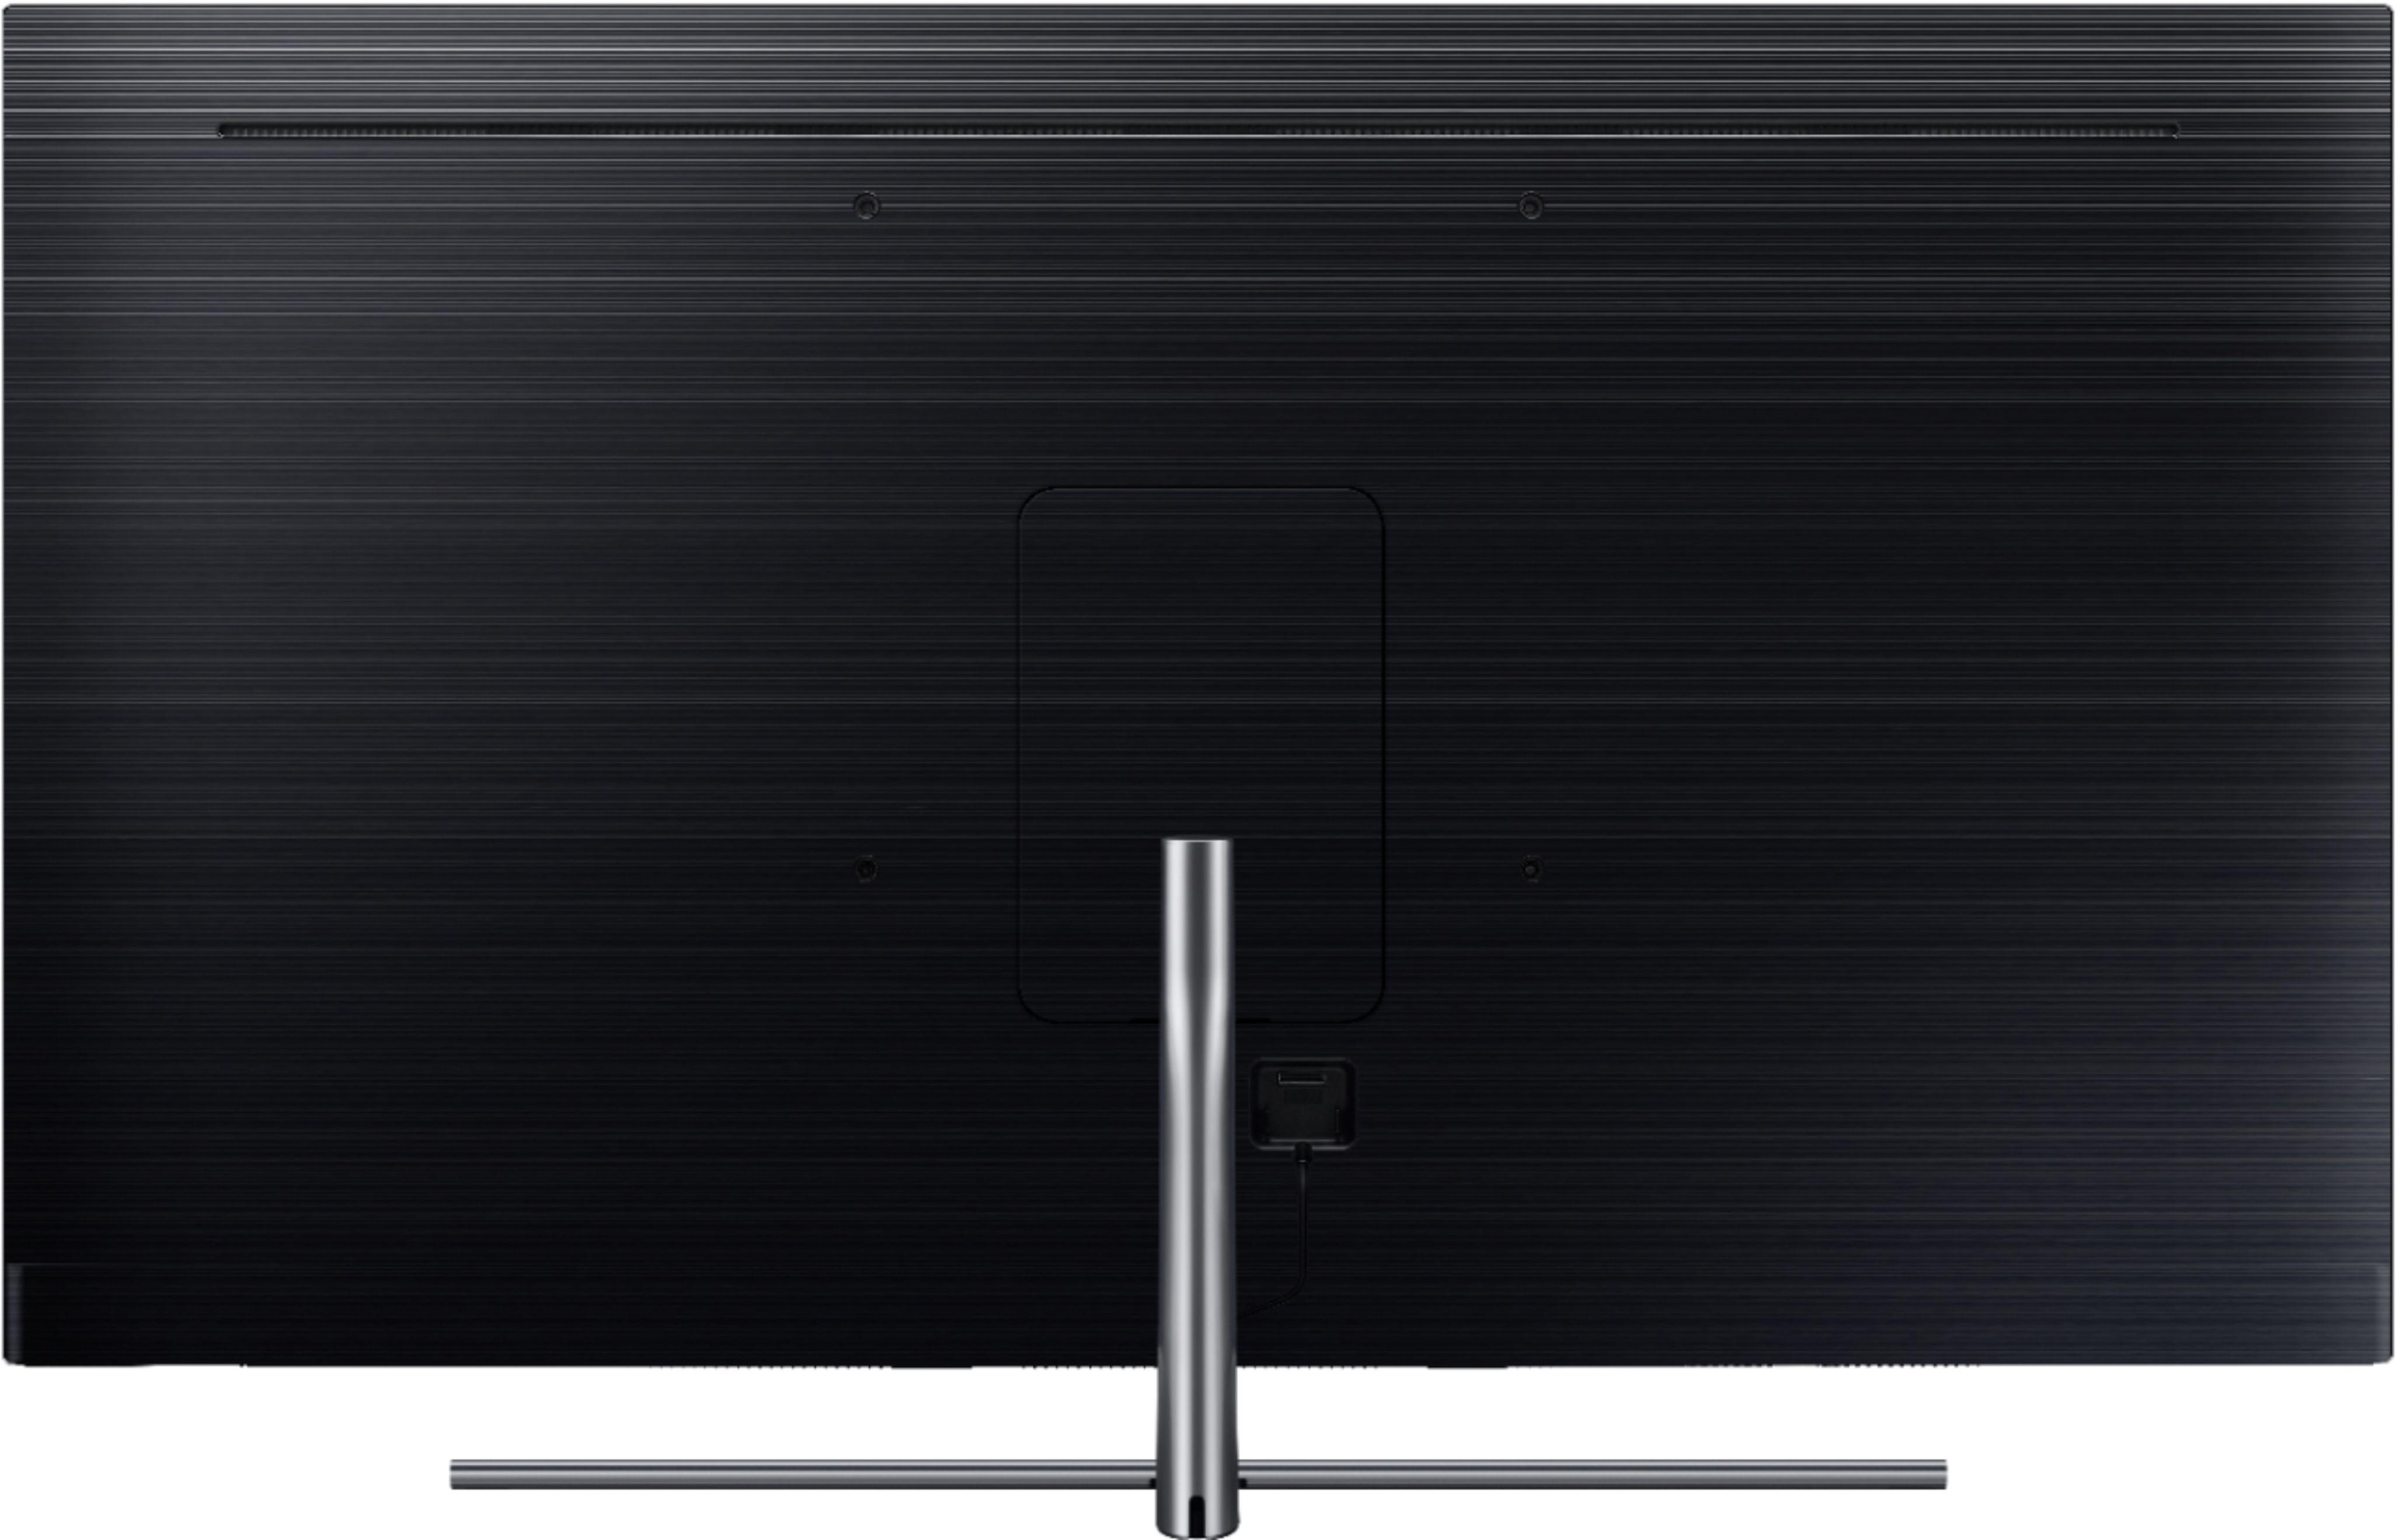 Image 16 for Samsung QN75Q7FNAFXZA